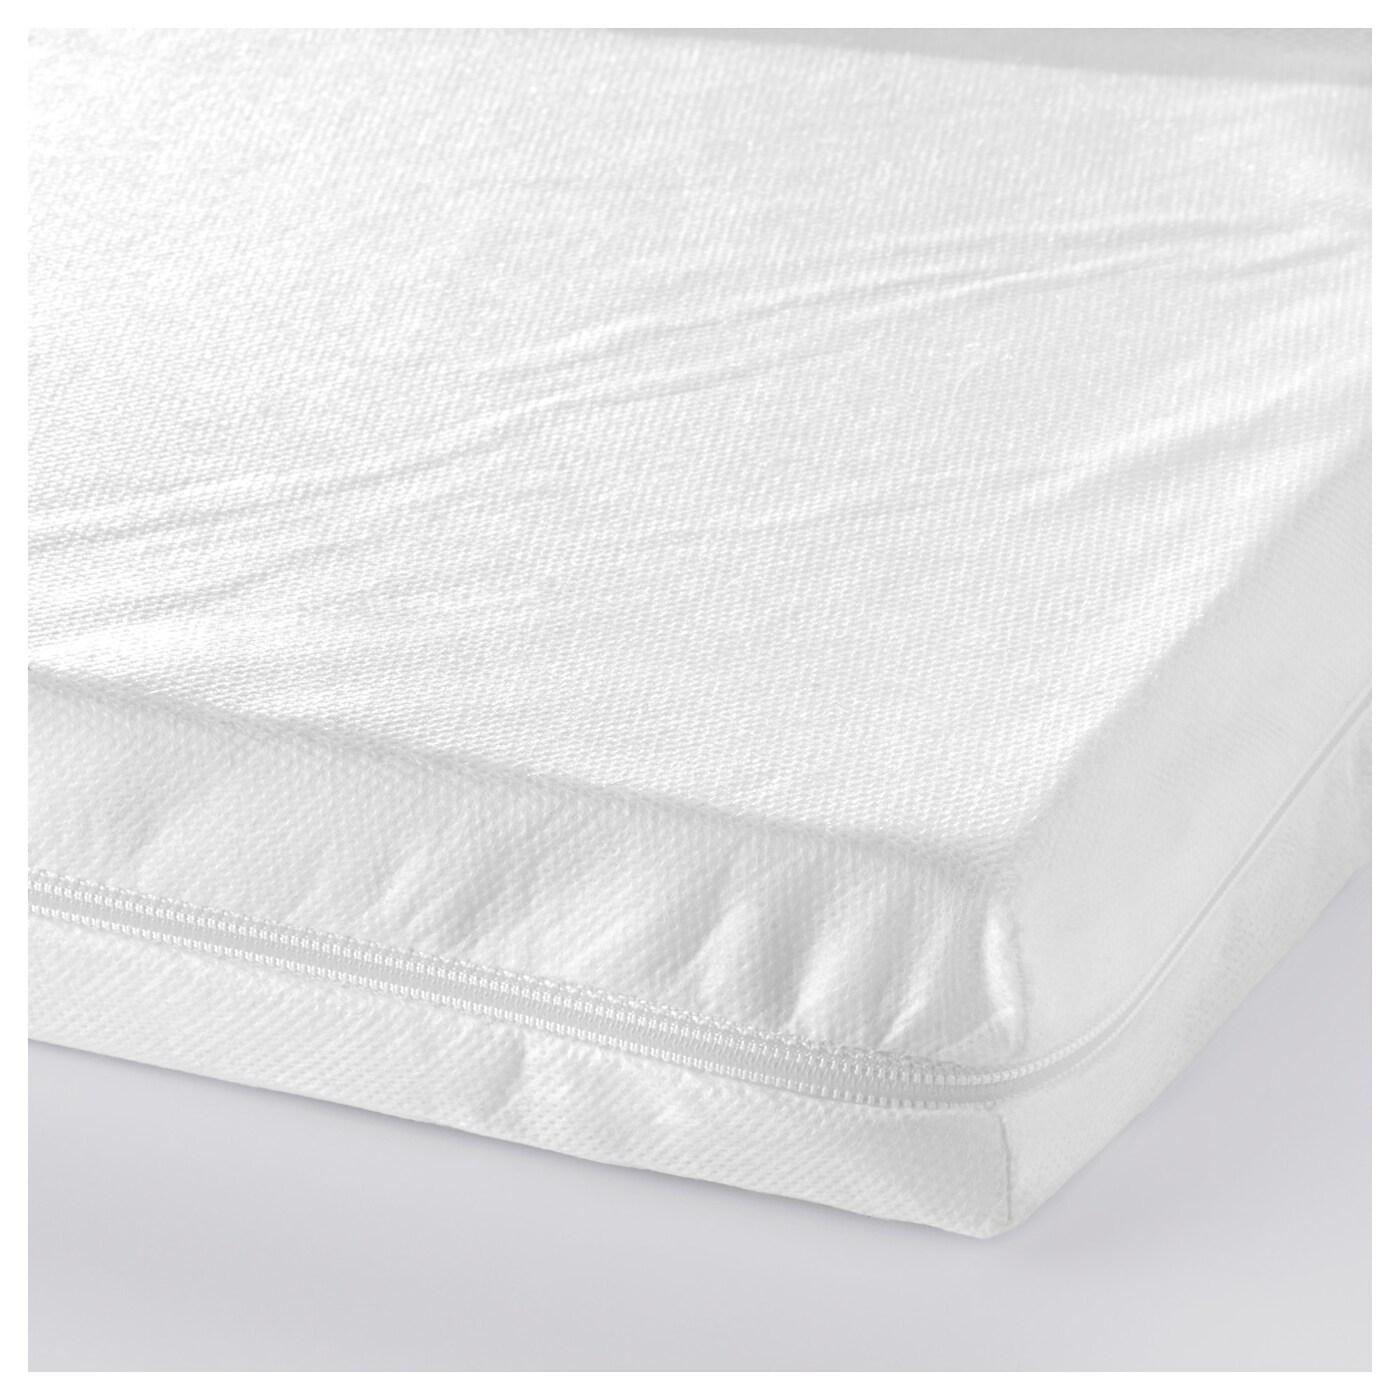 vyssa slappna mattress for cot white 60x120 cm ikea. Black Bedroom Furniture Sets. Home Design Ideas